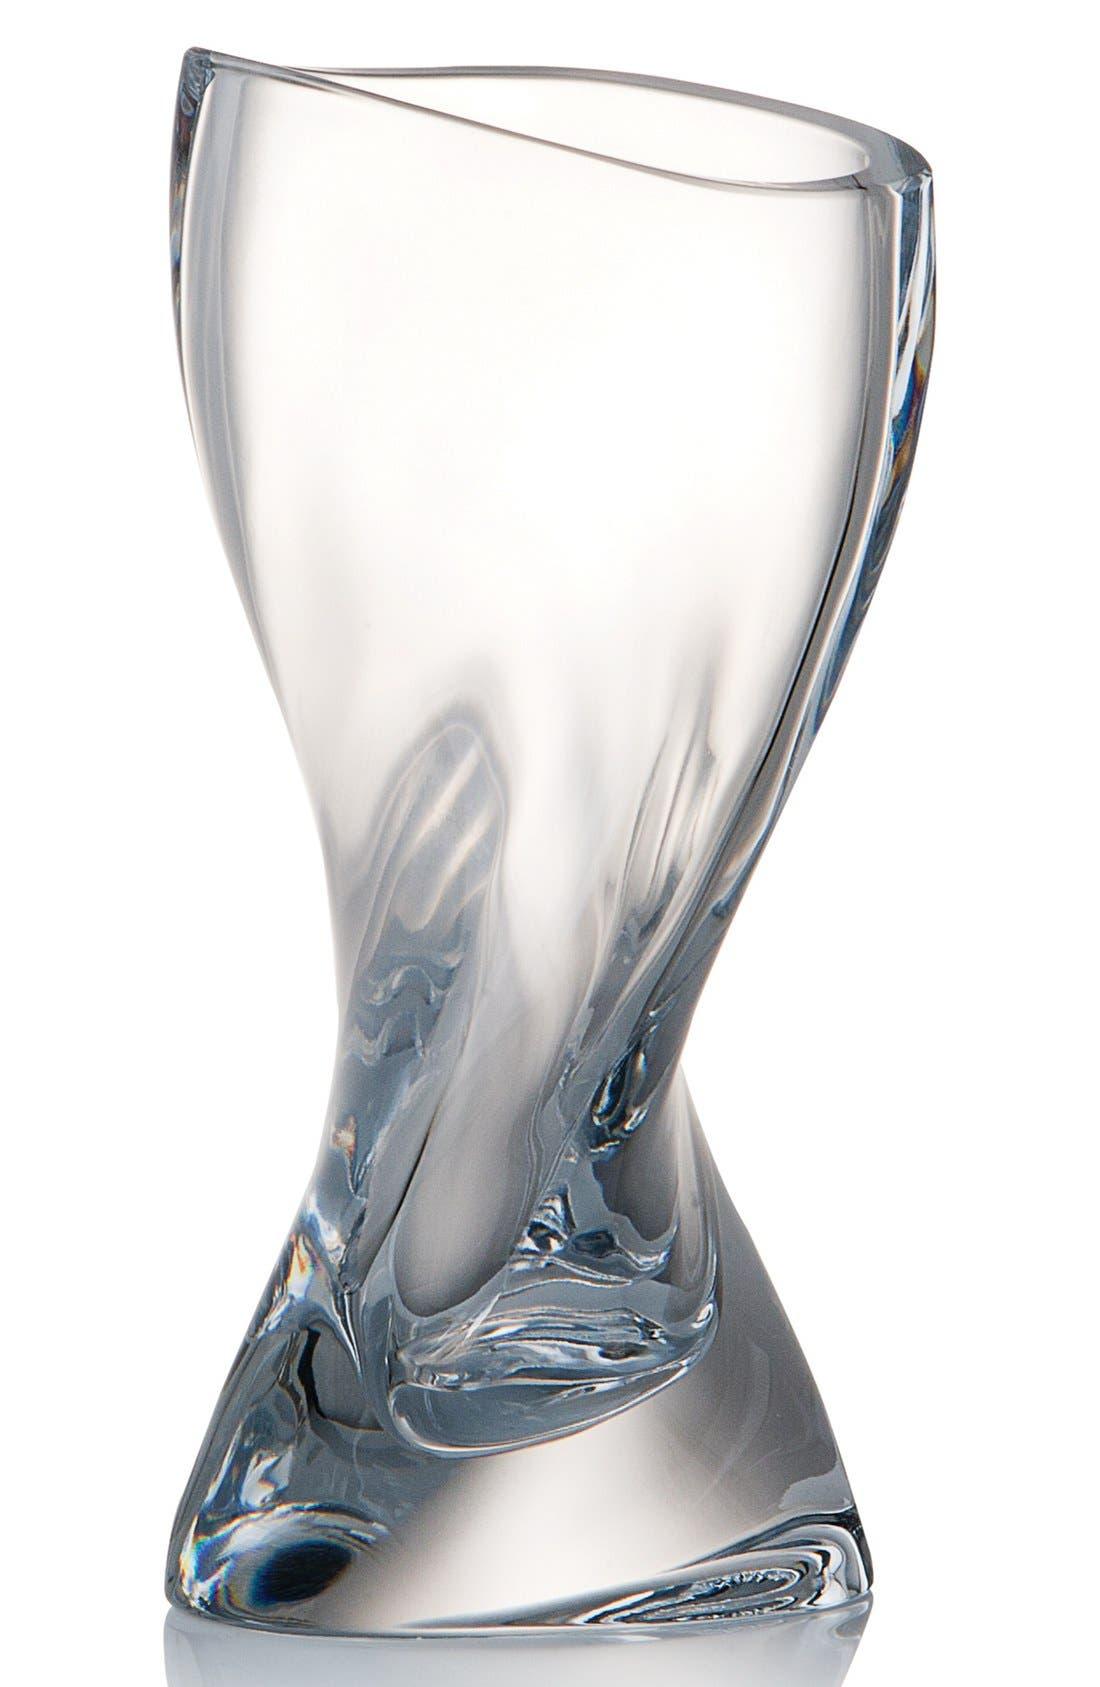 Alternate Image 1 Selected - Nambé 'River' Vase, Small